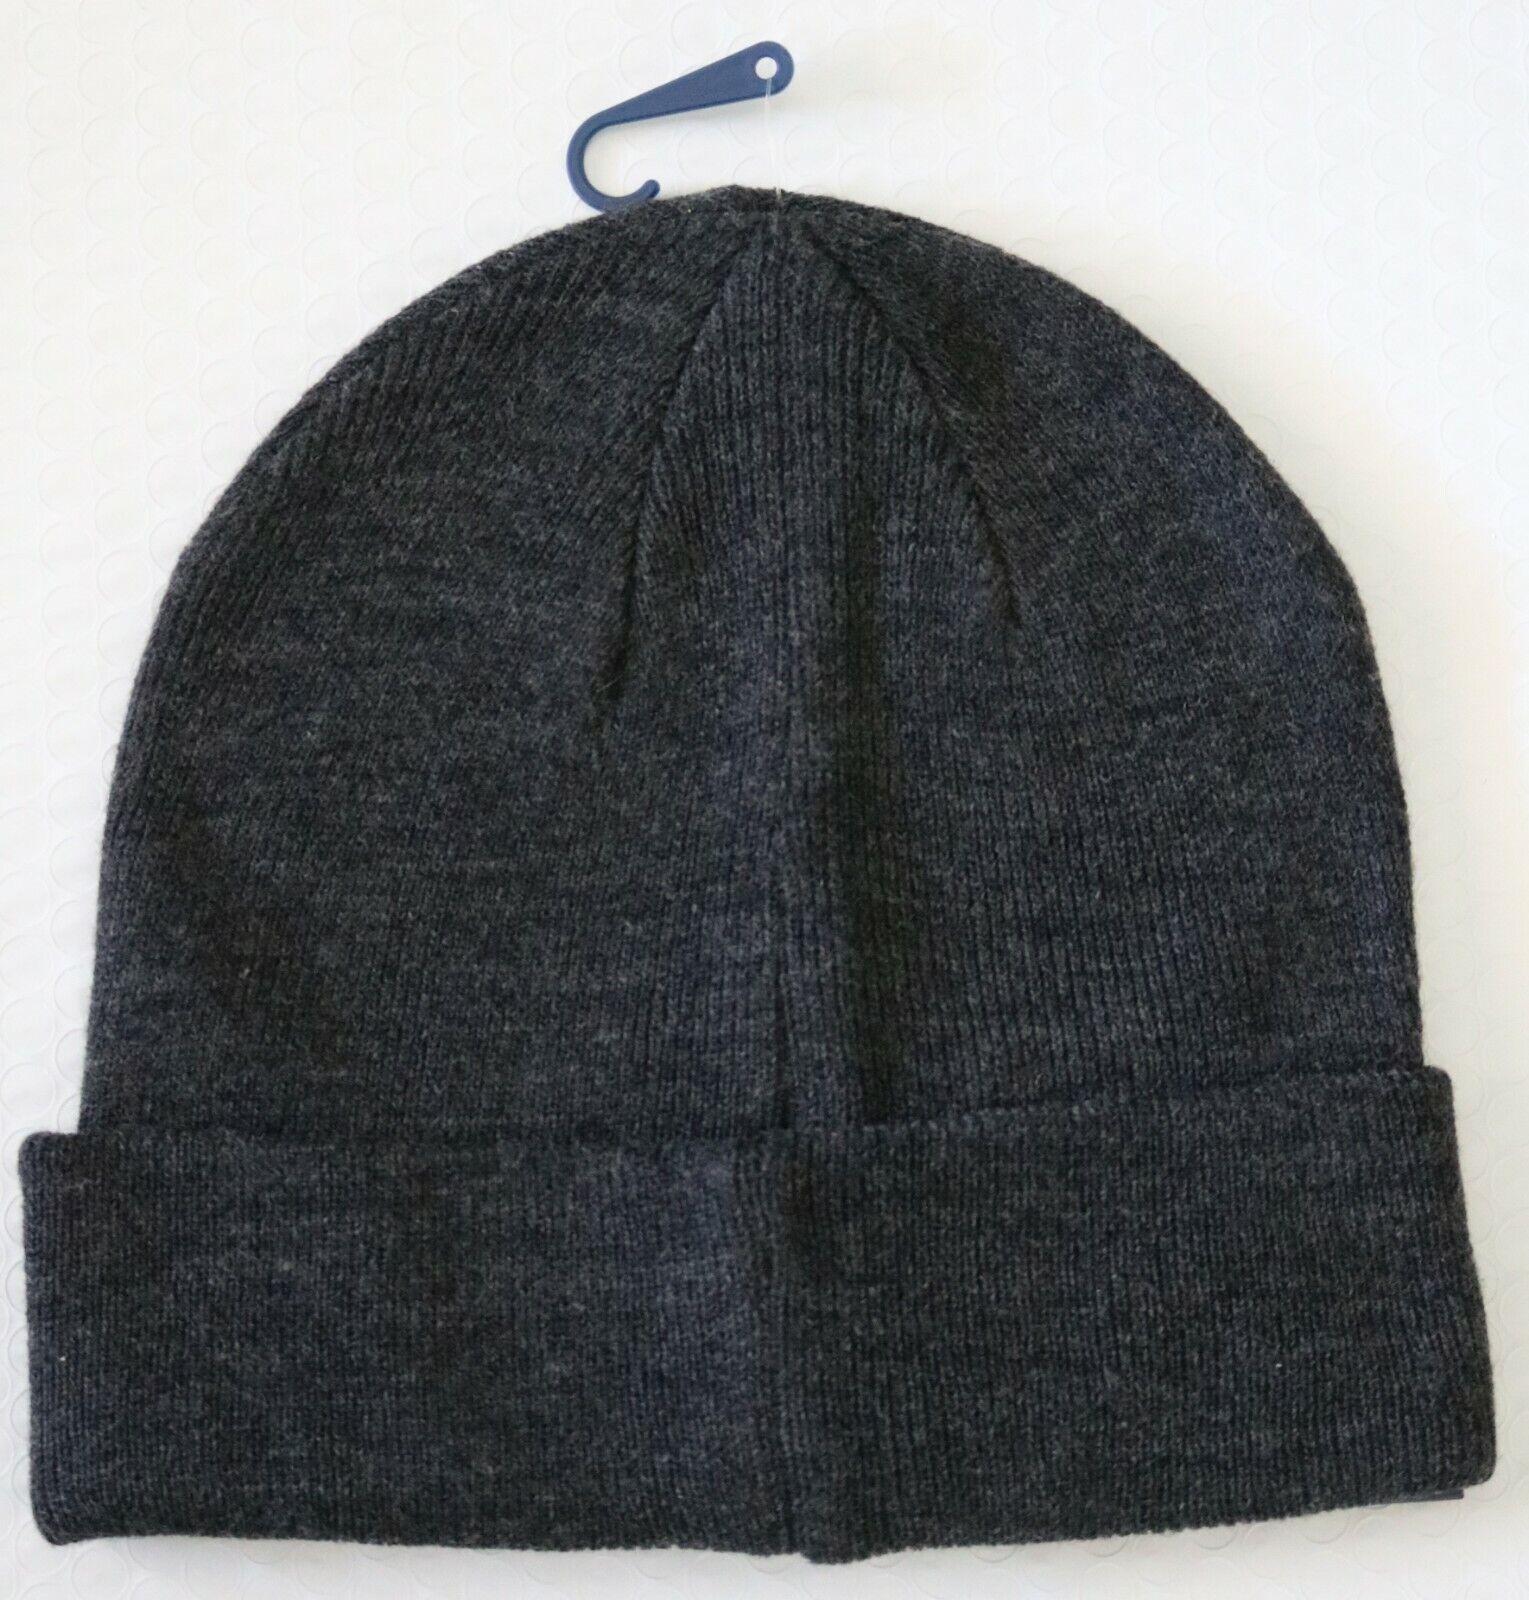 Tommy Hilfiger Mens Cap Hat Beanie Dark Gray One Size  e6eb09a0e6c8